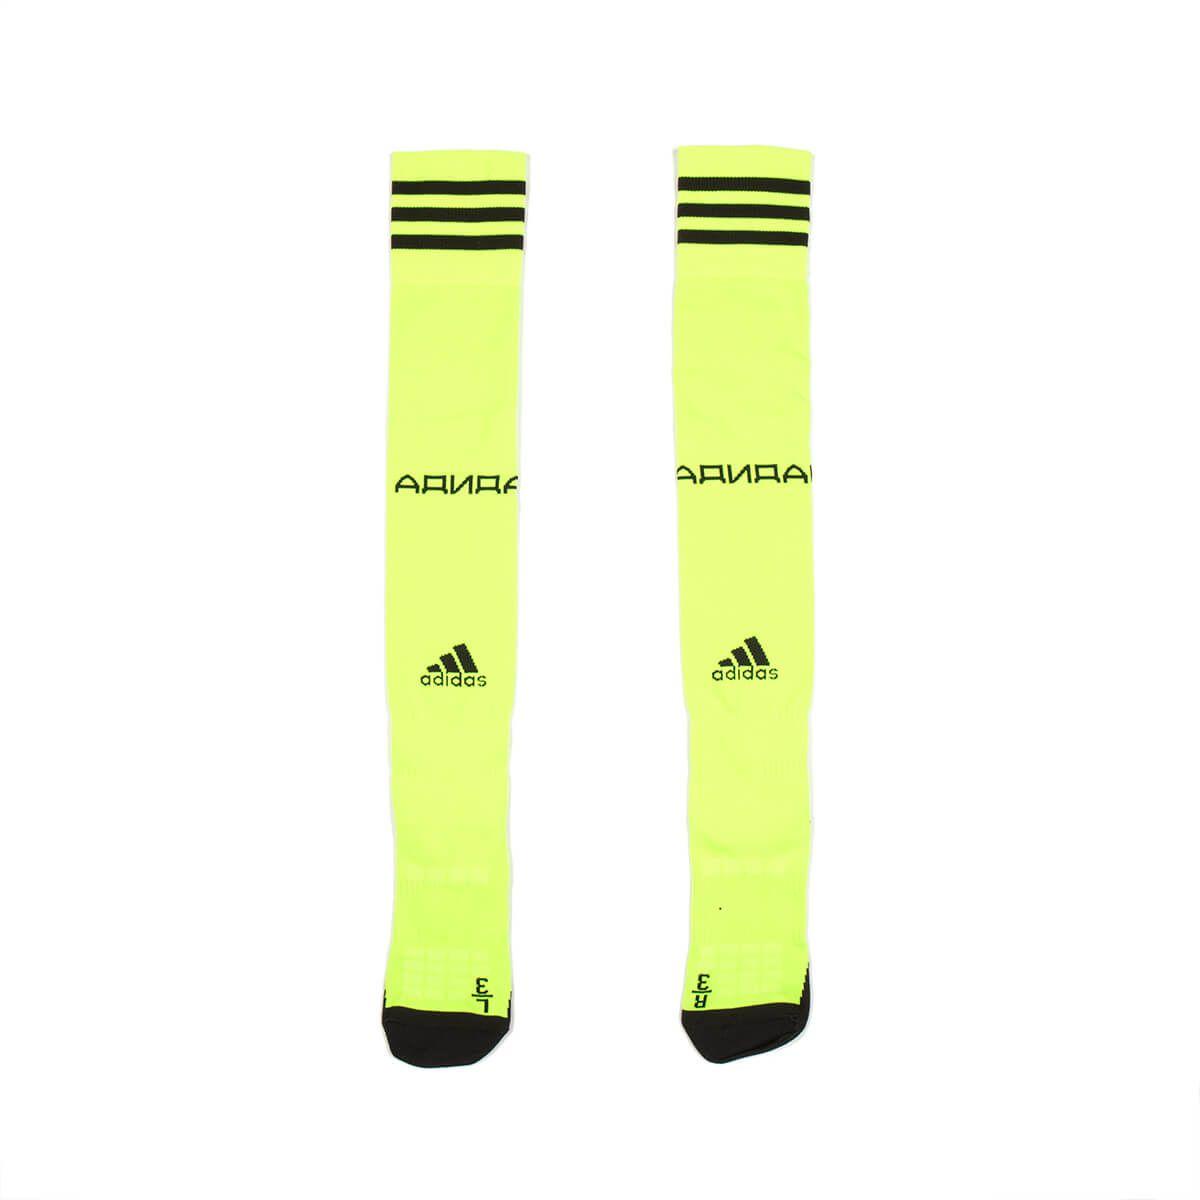 gosha rubchinskiy -  Adidas Socks